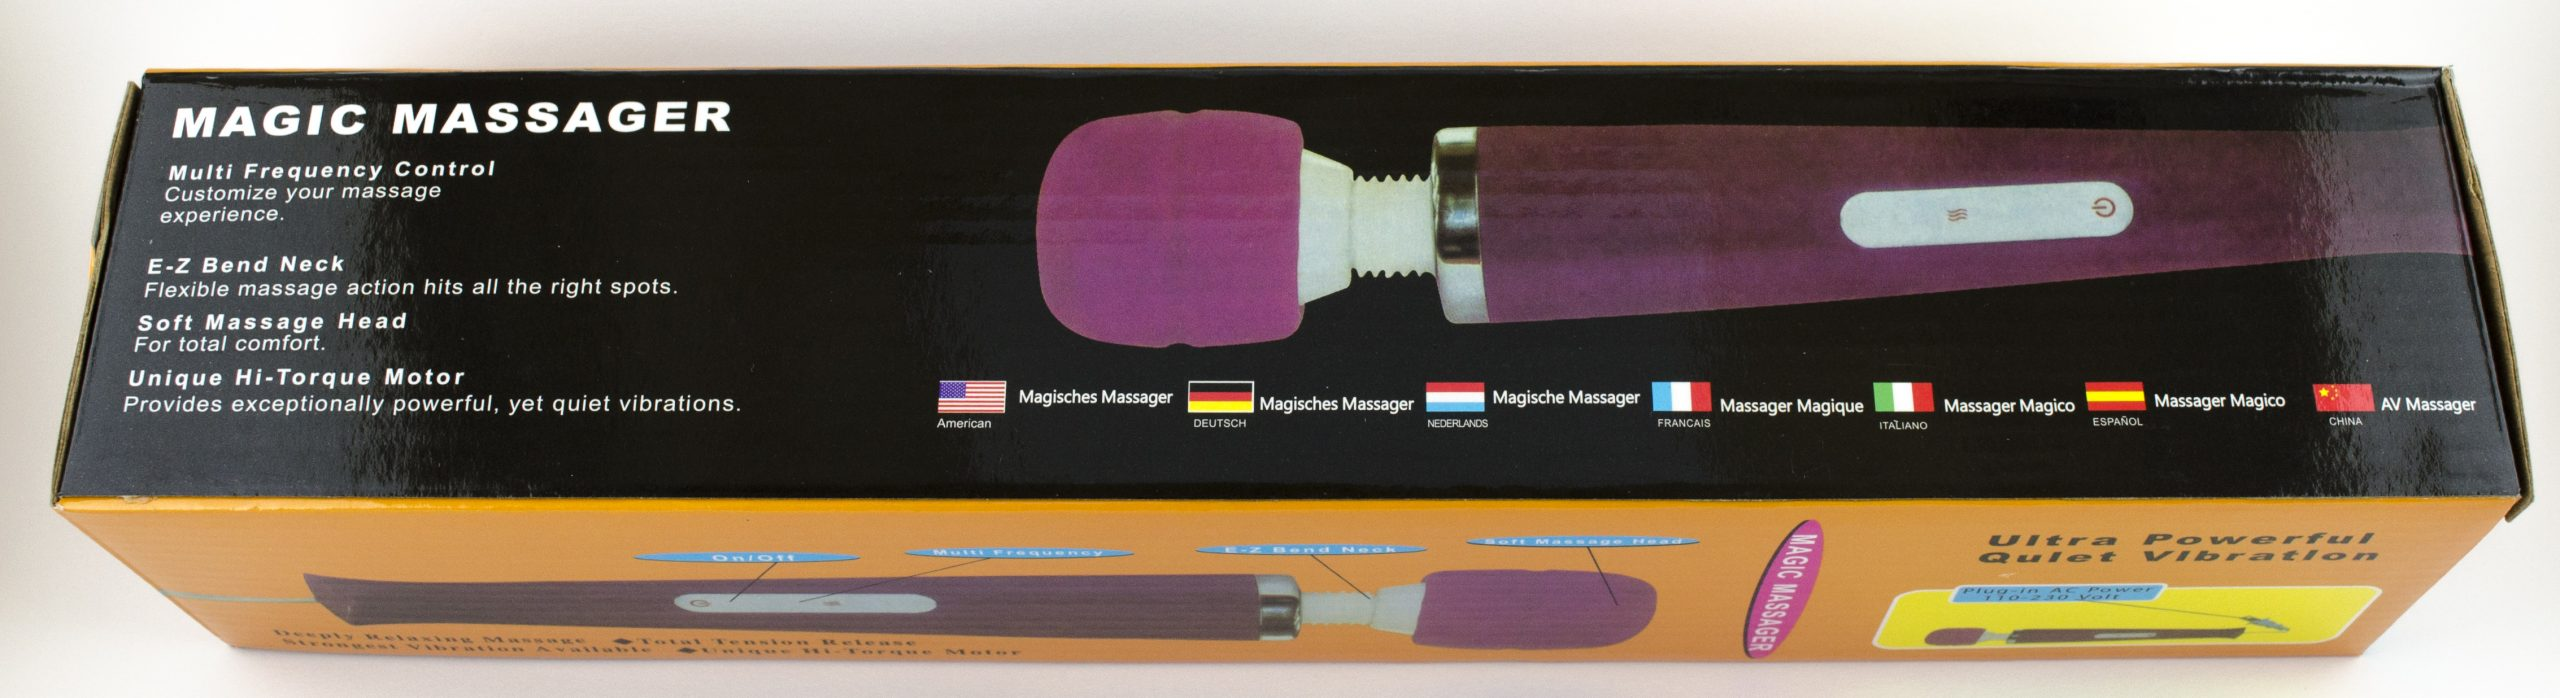 Magic Massage Vibrator